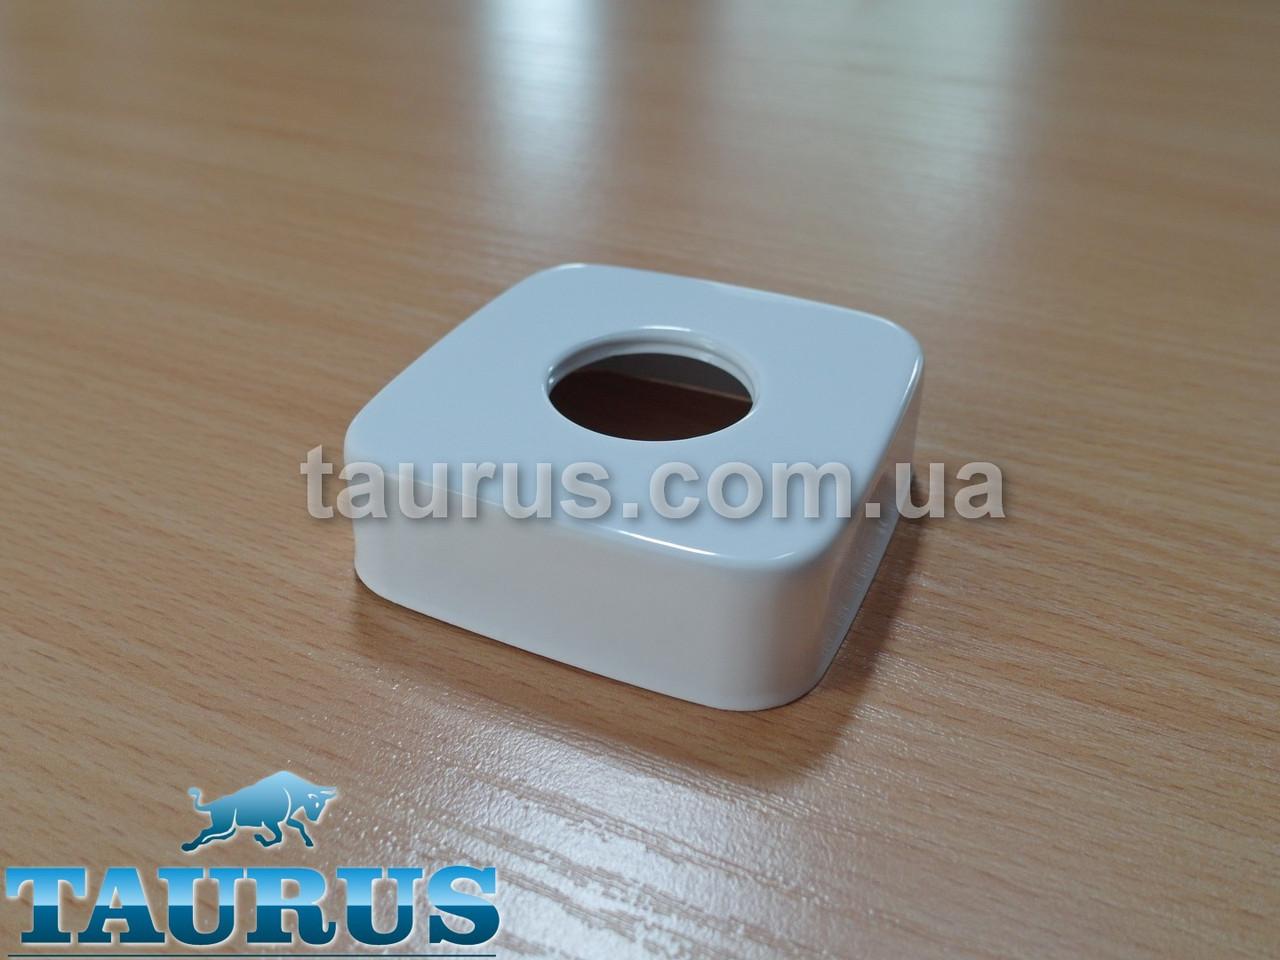 "Большой квадратный декоративный белый фланец CUBE 60x60х20 white d25 мм (3/4"") чашка, розета. TAURUS"